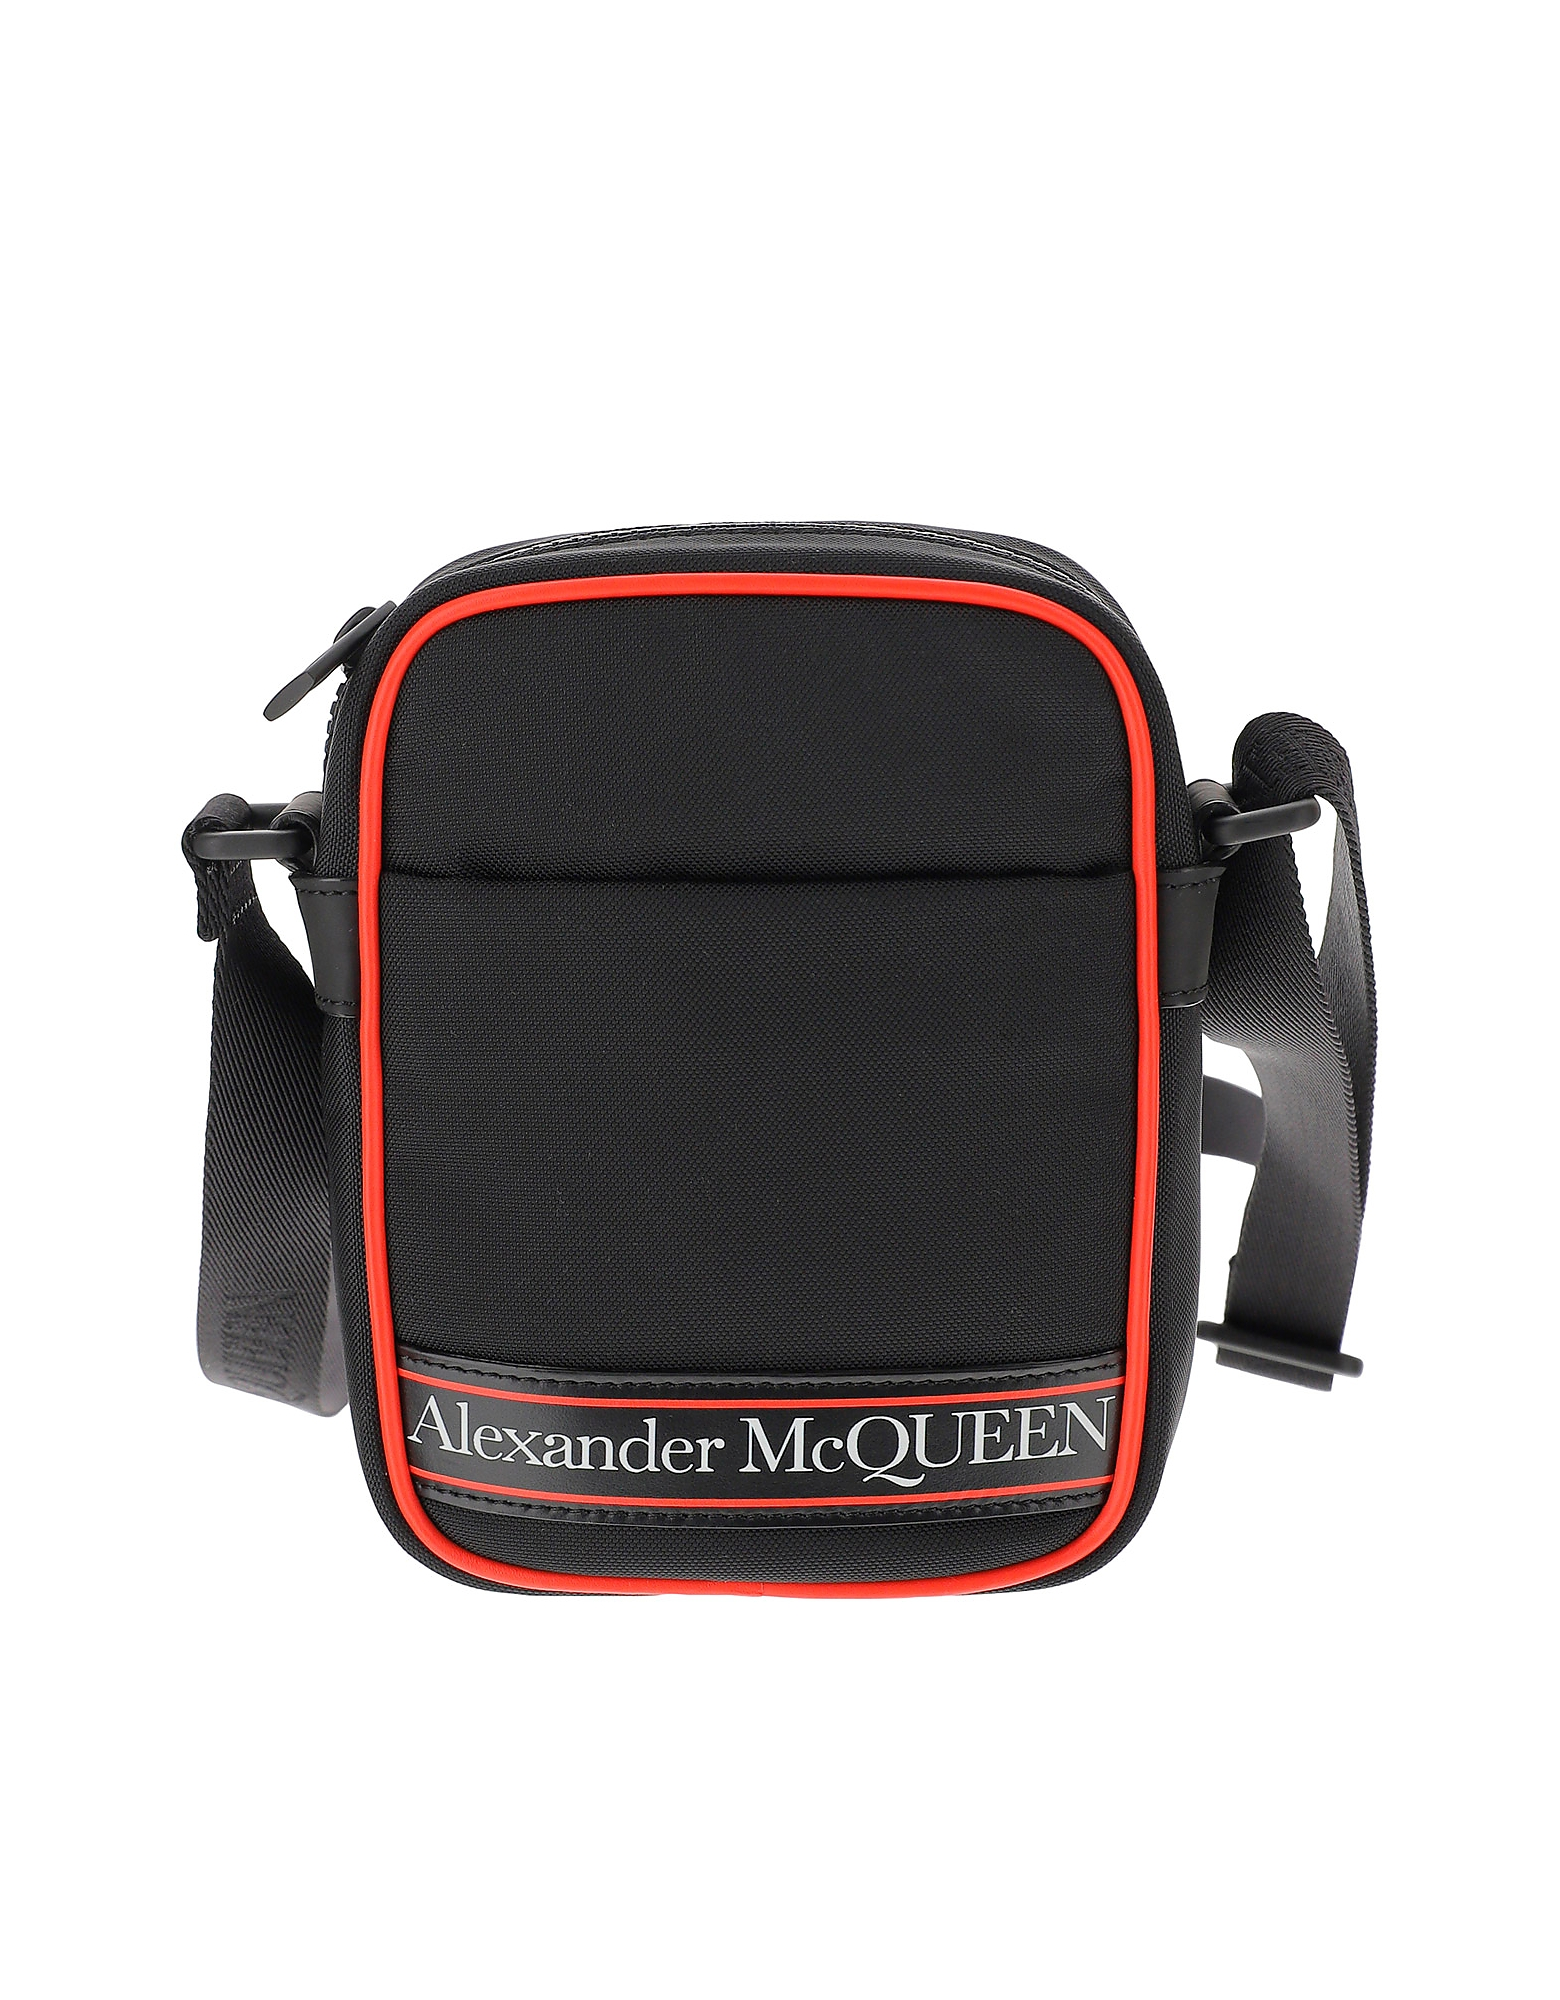 Alexander McQueen Designer Men's Bags, Black and Red Signature Crossbody Bag